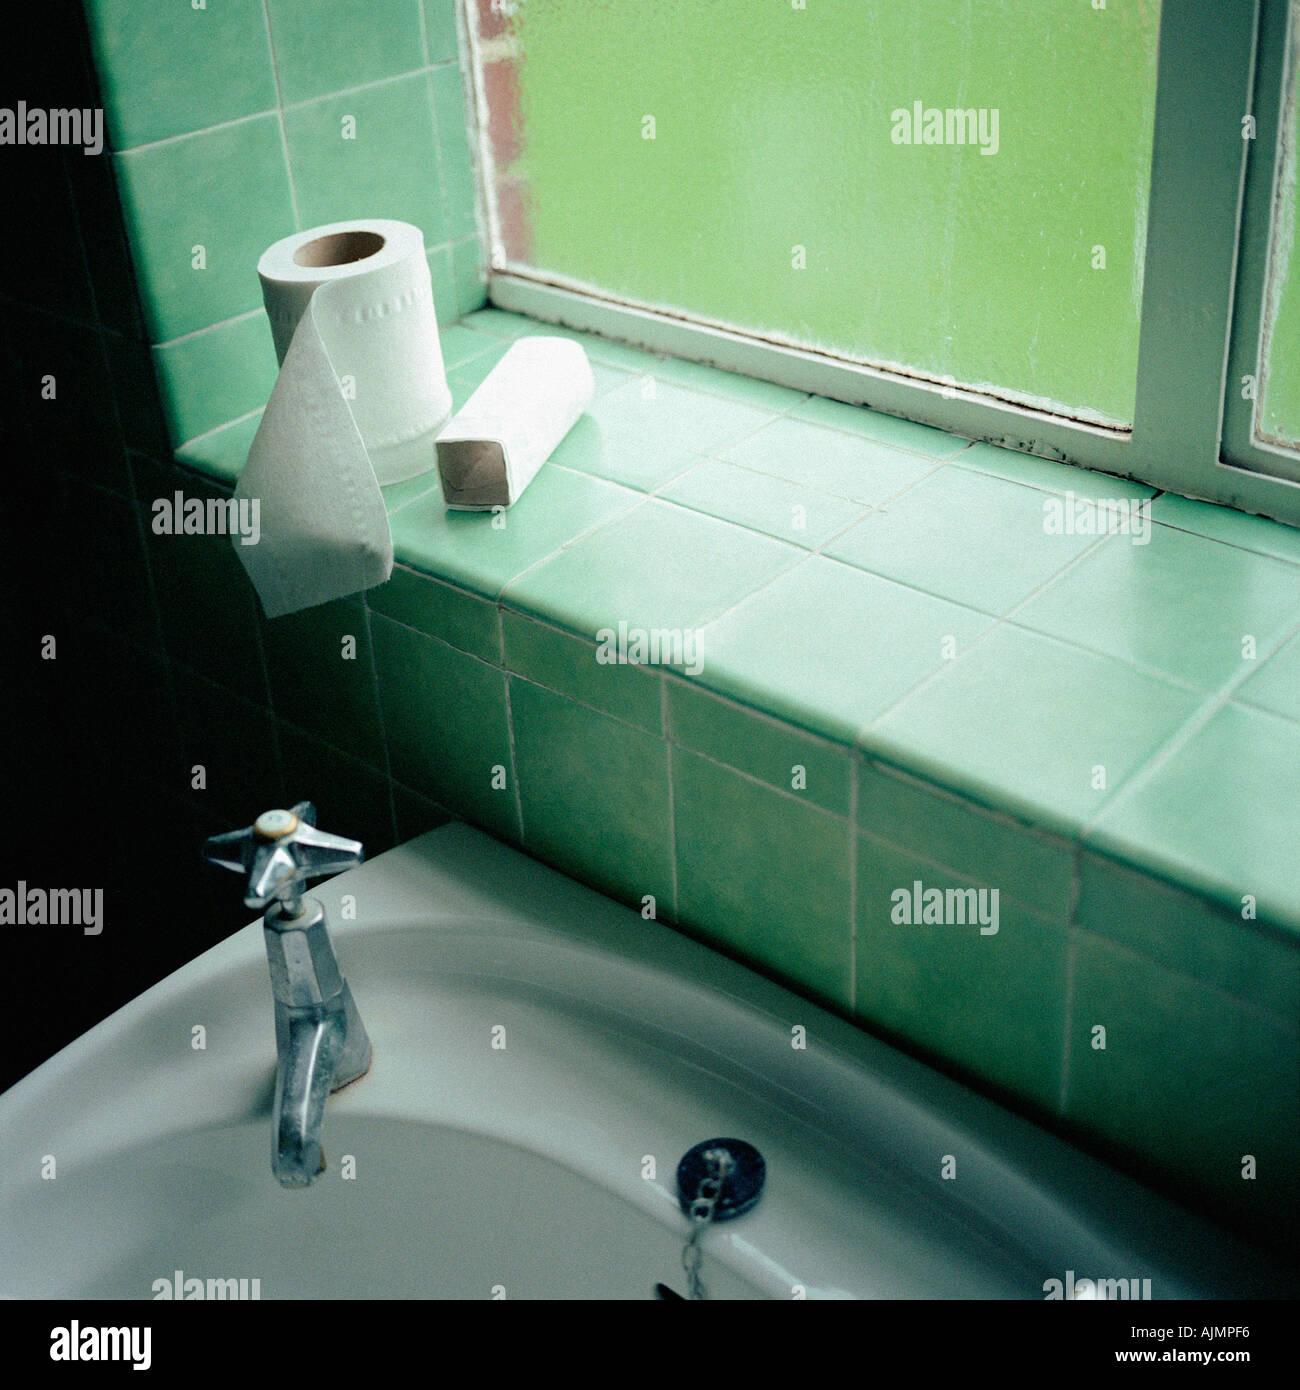 Bathroom Sink And Toilet Stock Photos & Bathroom Sink And Toilet ...